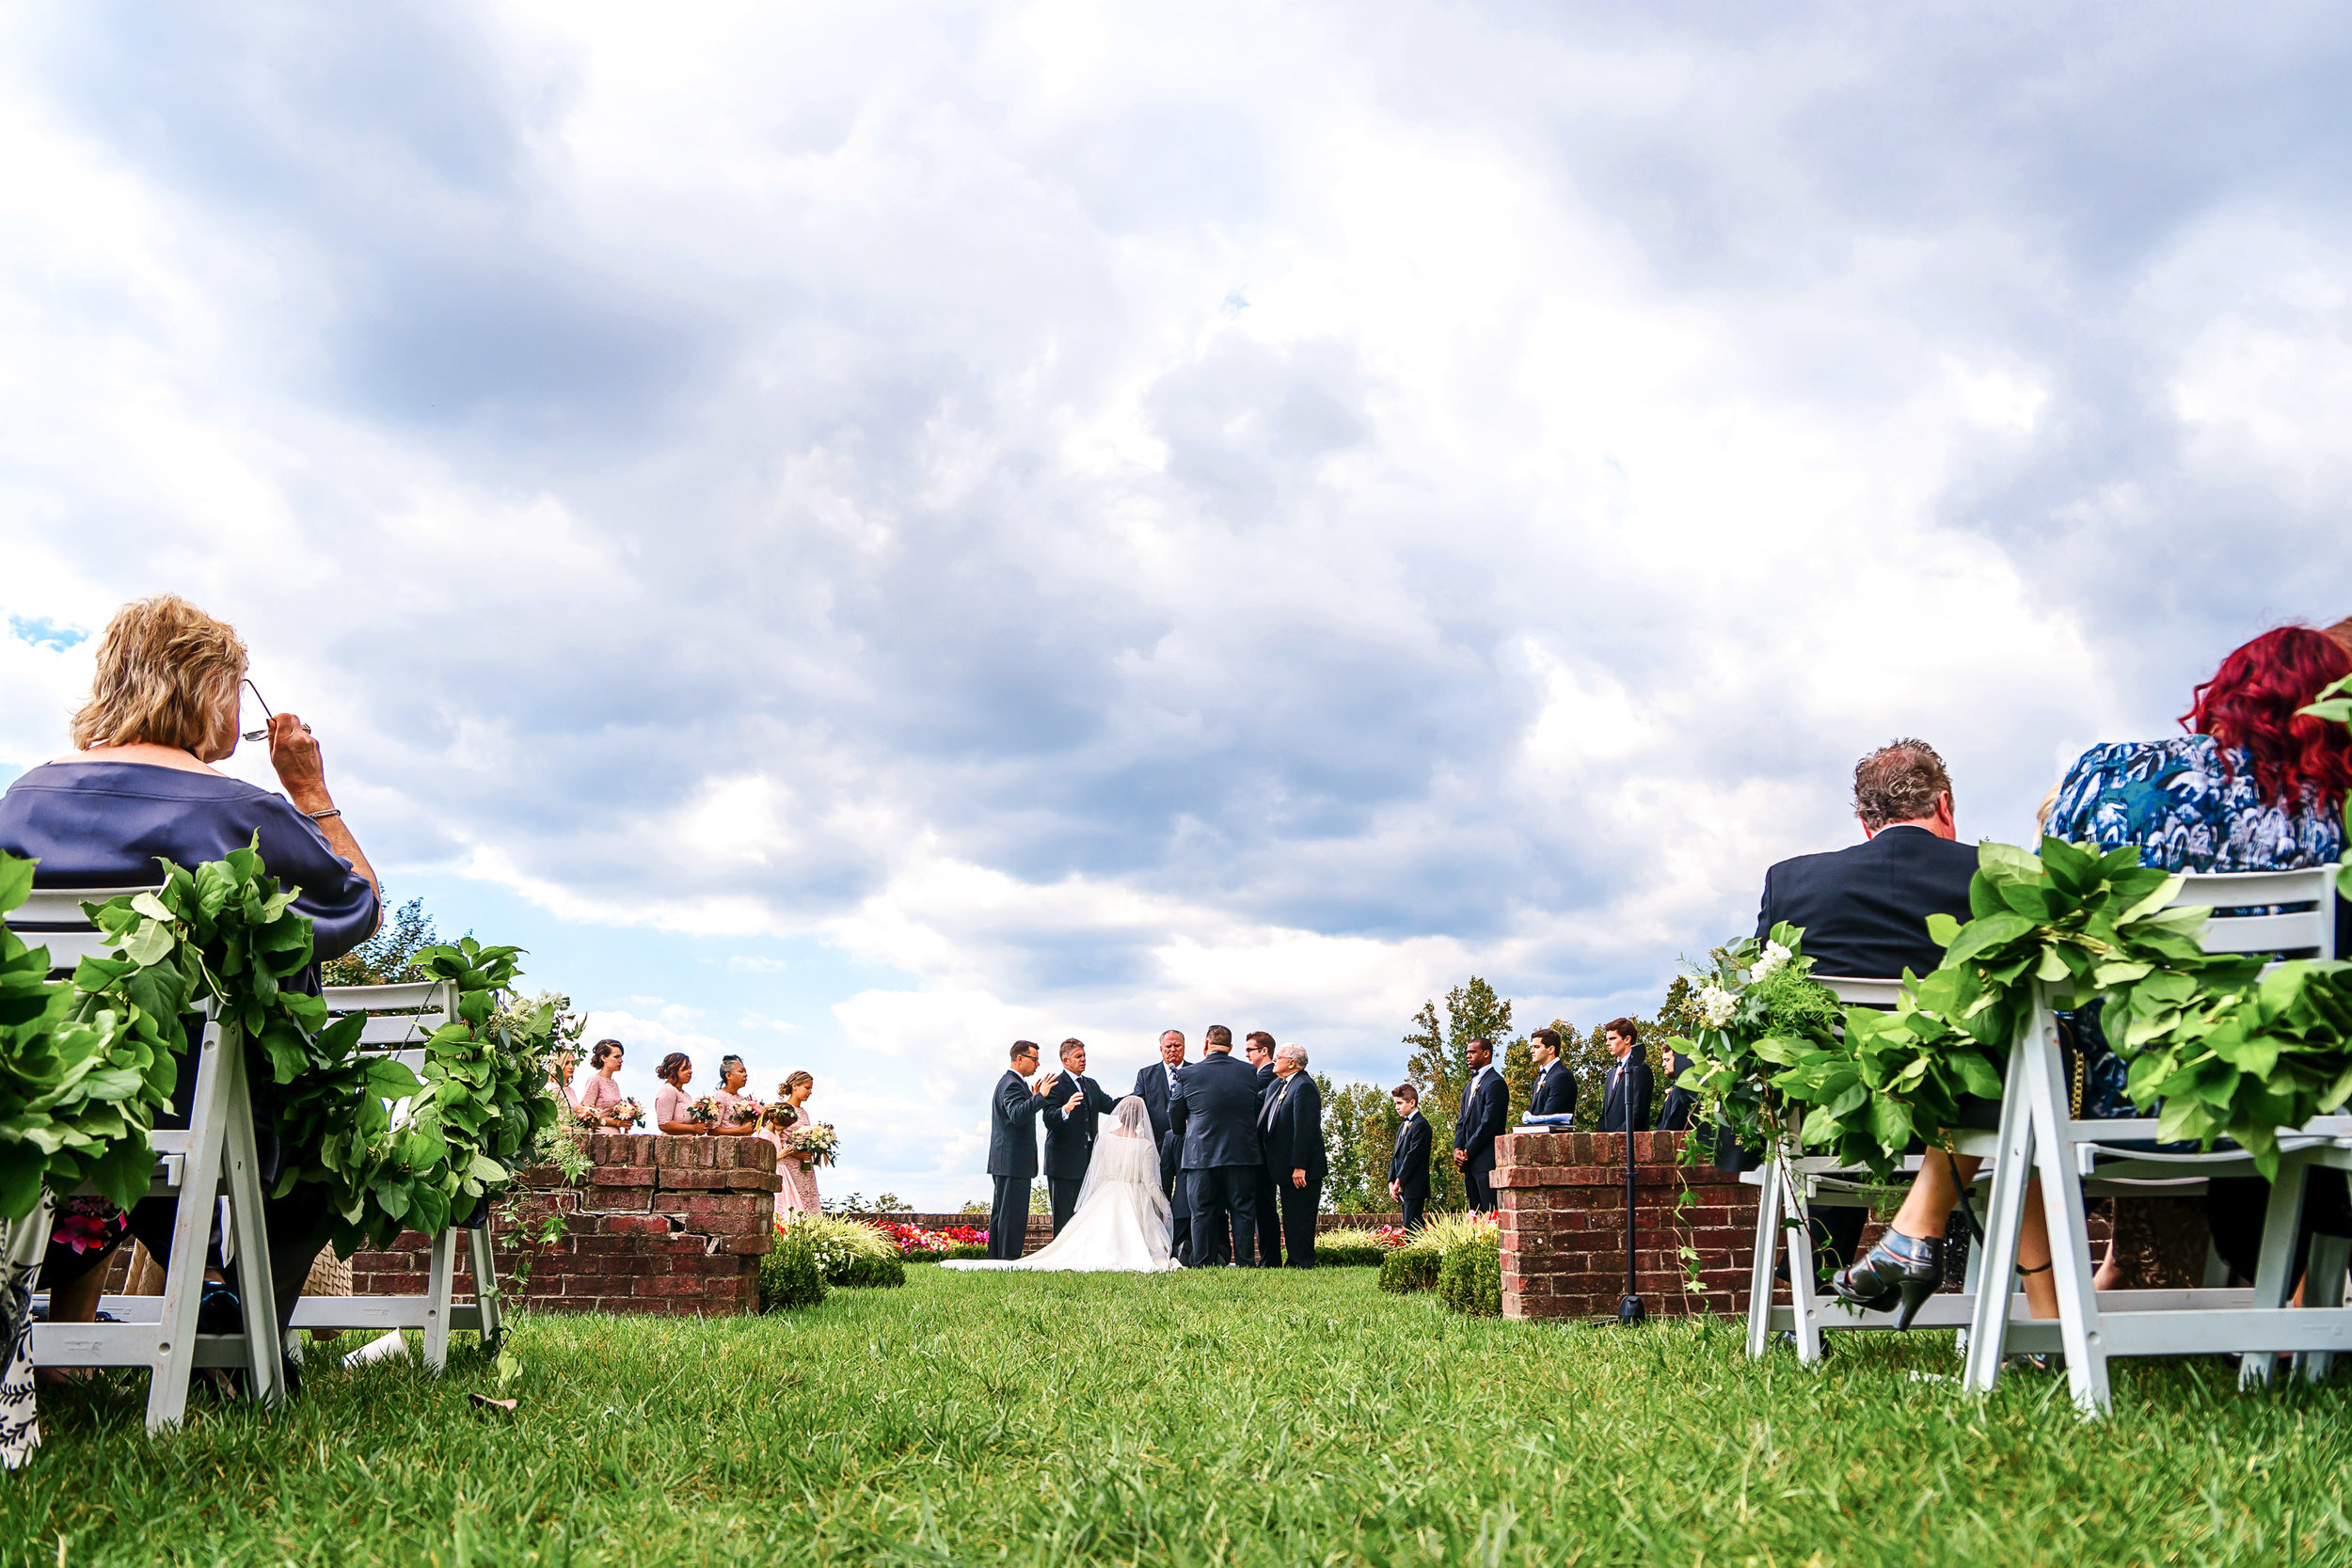 Dramatic clouds wedding ceremony photo at Oxon Hill Manor by Jessica Nazarova